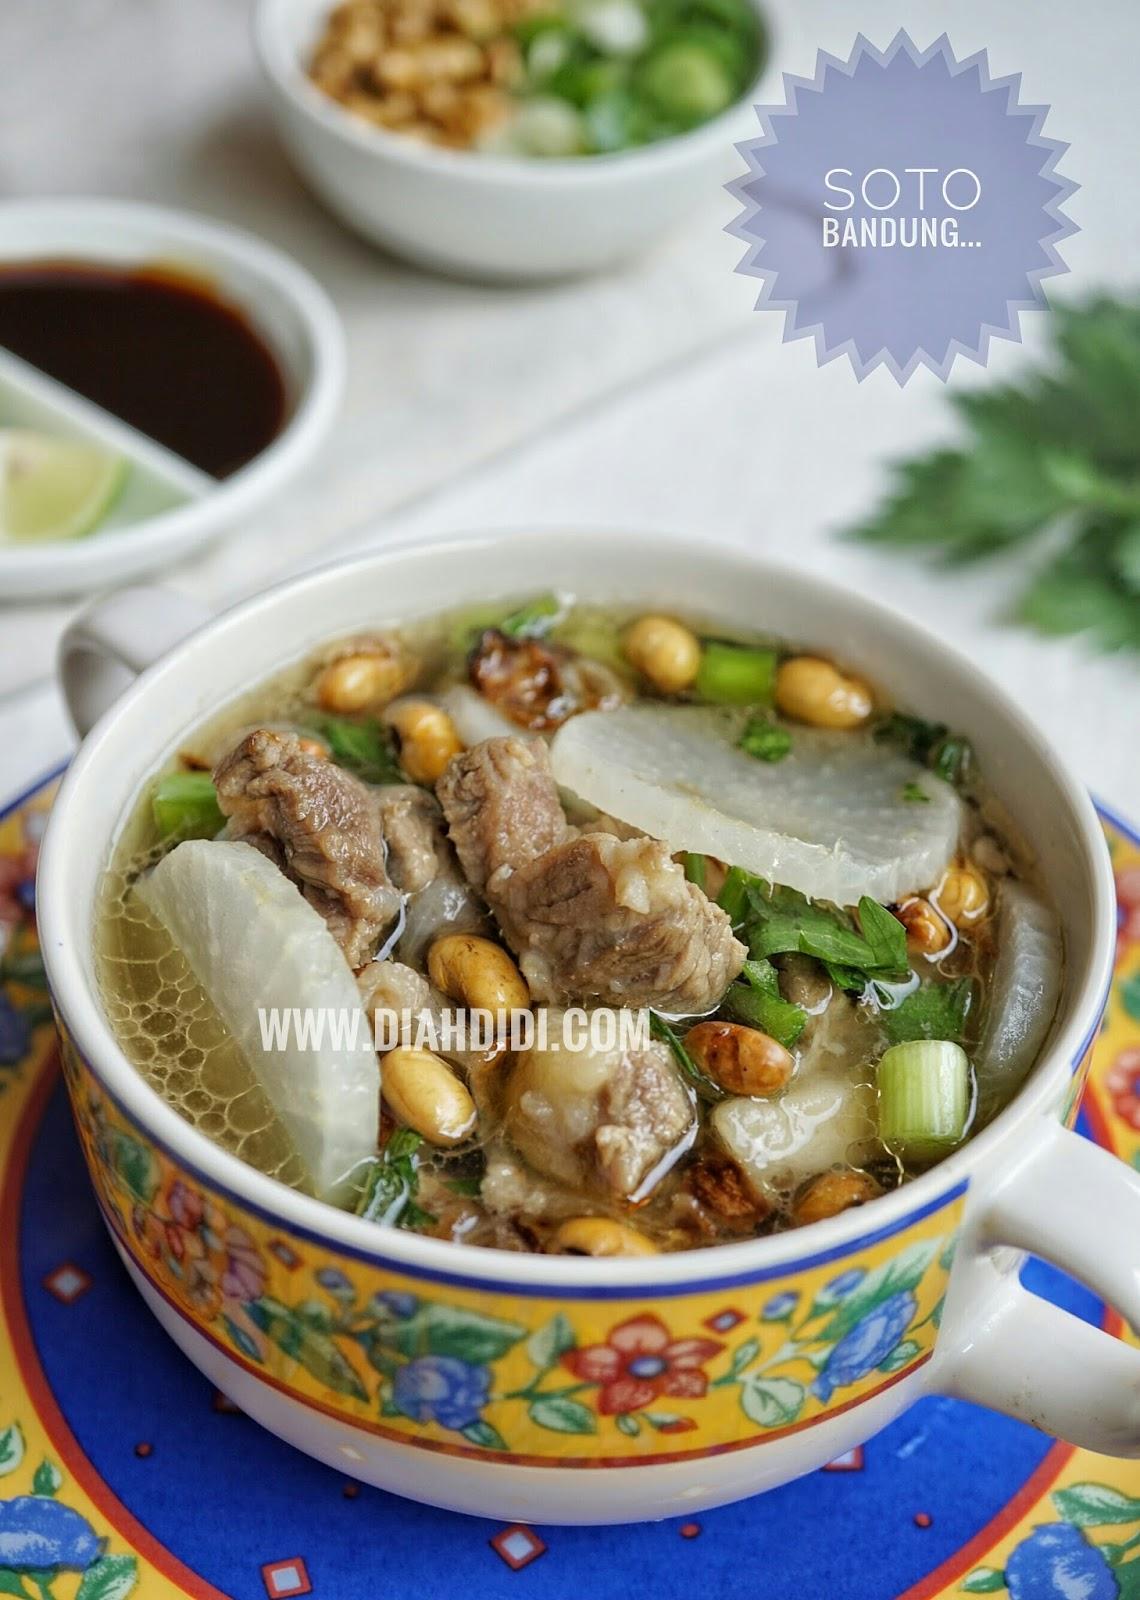 Resep Soto Bandung Daging Sapi : resep, bandung, daging, Didi's, Kitchen:, Bandung